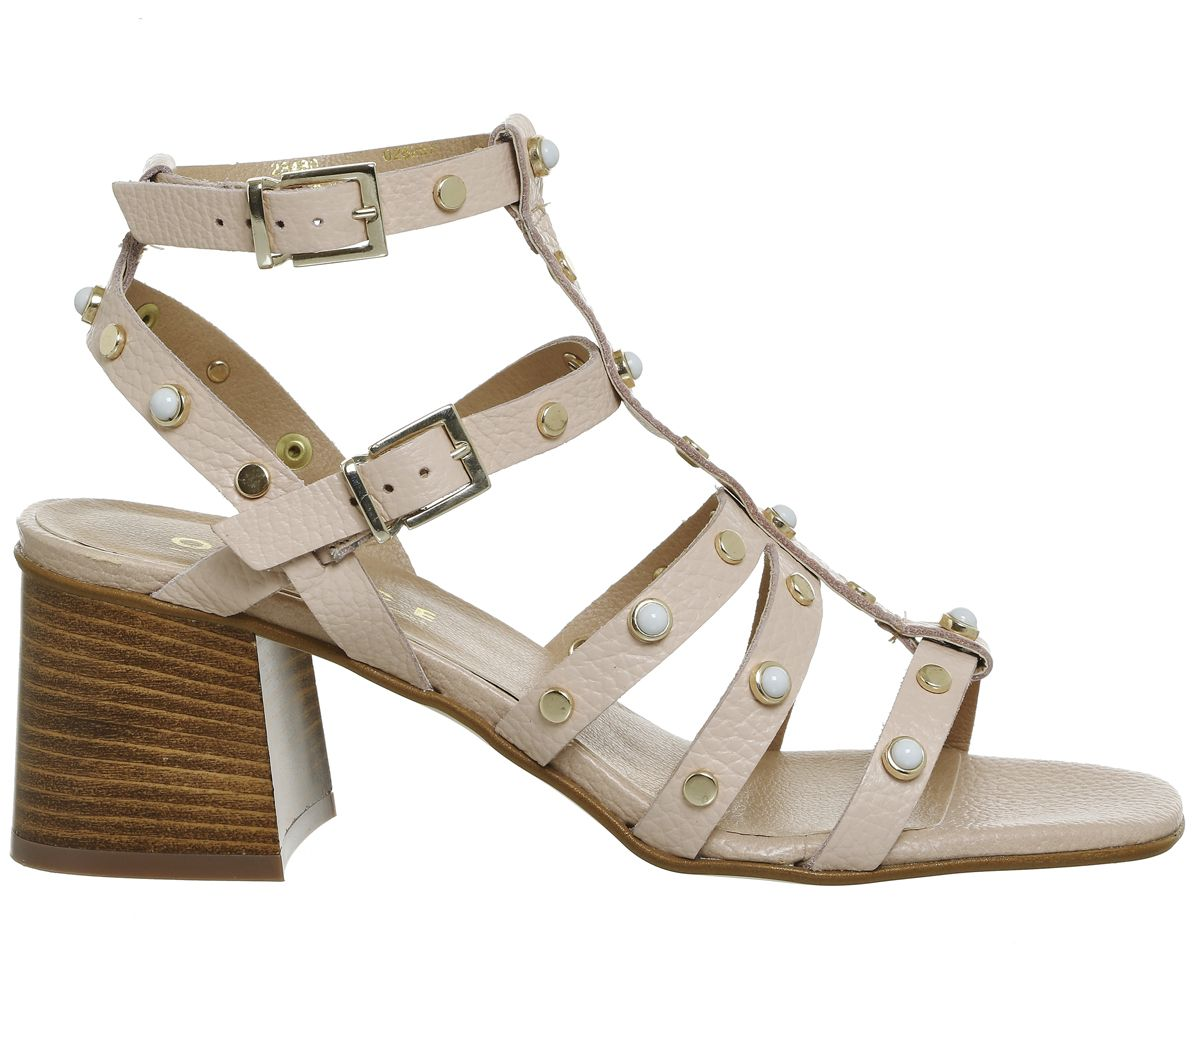 af511c6d948 Office Margate Studded Strappy Block Heel Nude Leather - Mid Heels